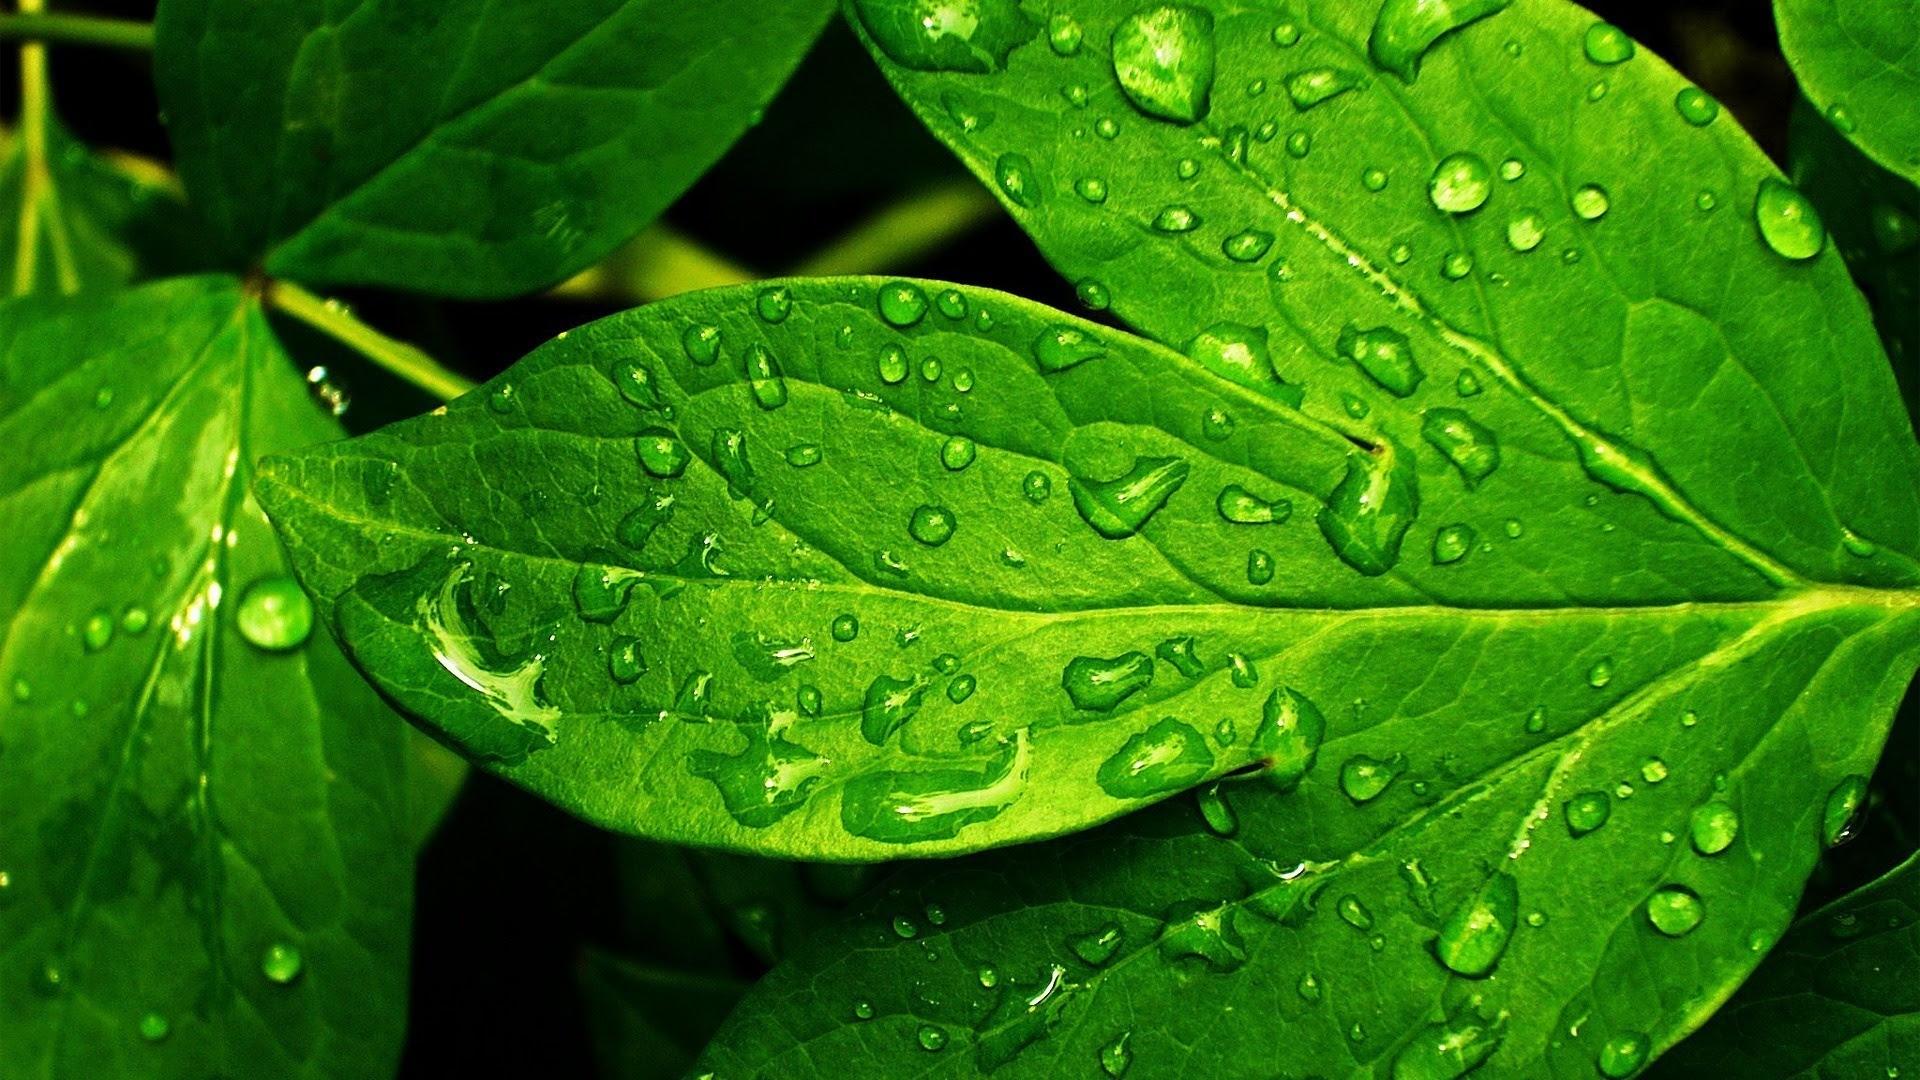 Beautiful Wallpaper Hd Green Leaf Wallpaper